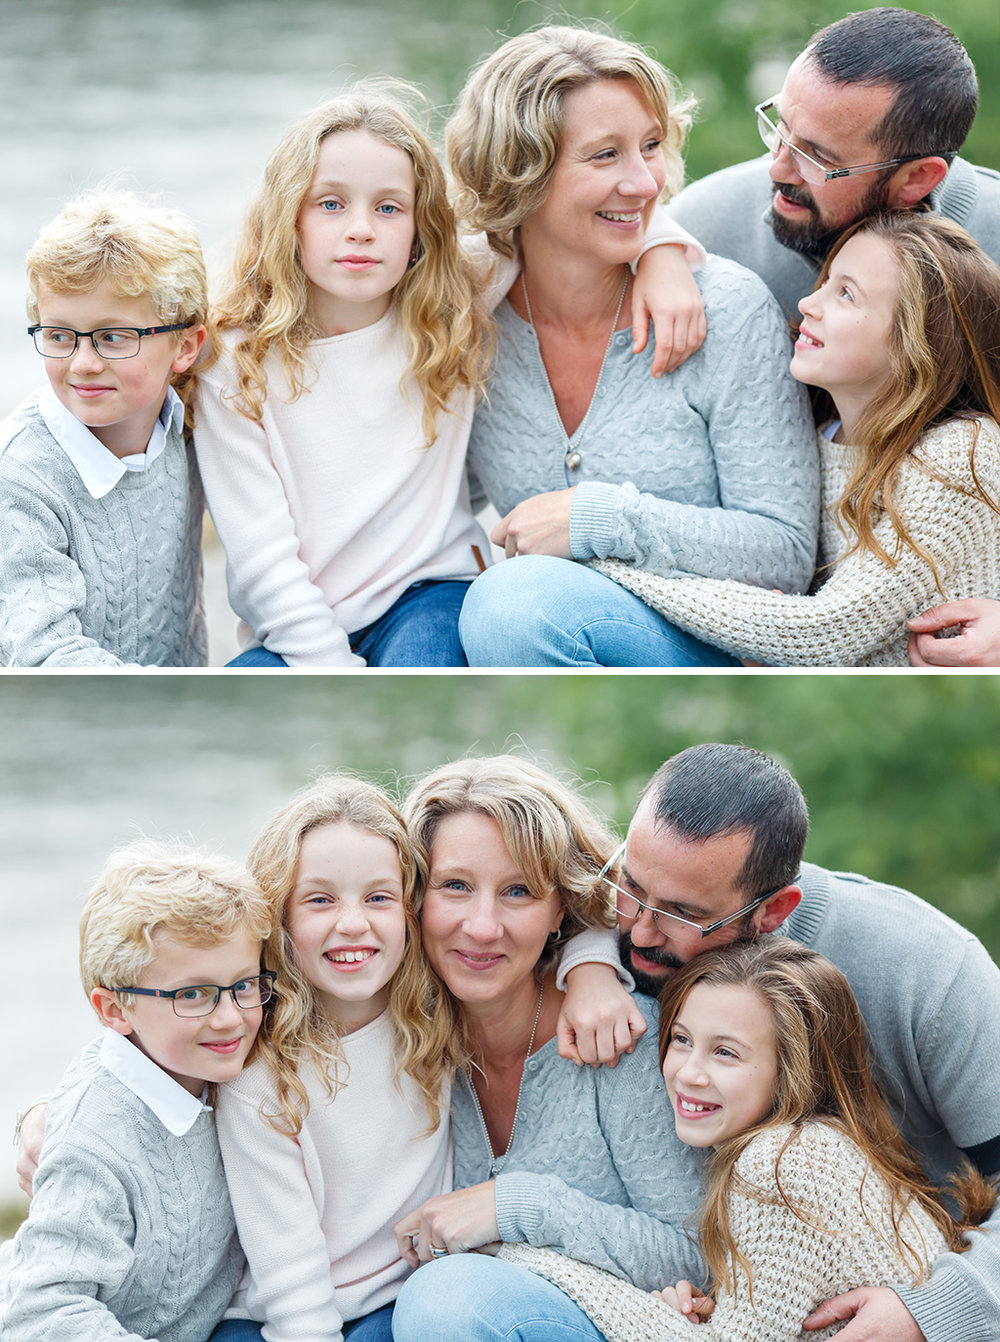 Familjefotografering_i-Stockholm_Lifestyle-familjefotograf-Anna-Sandstrom_8.jpg